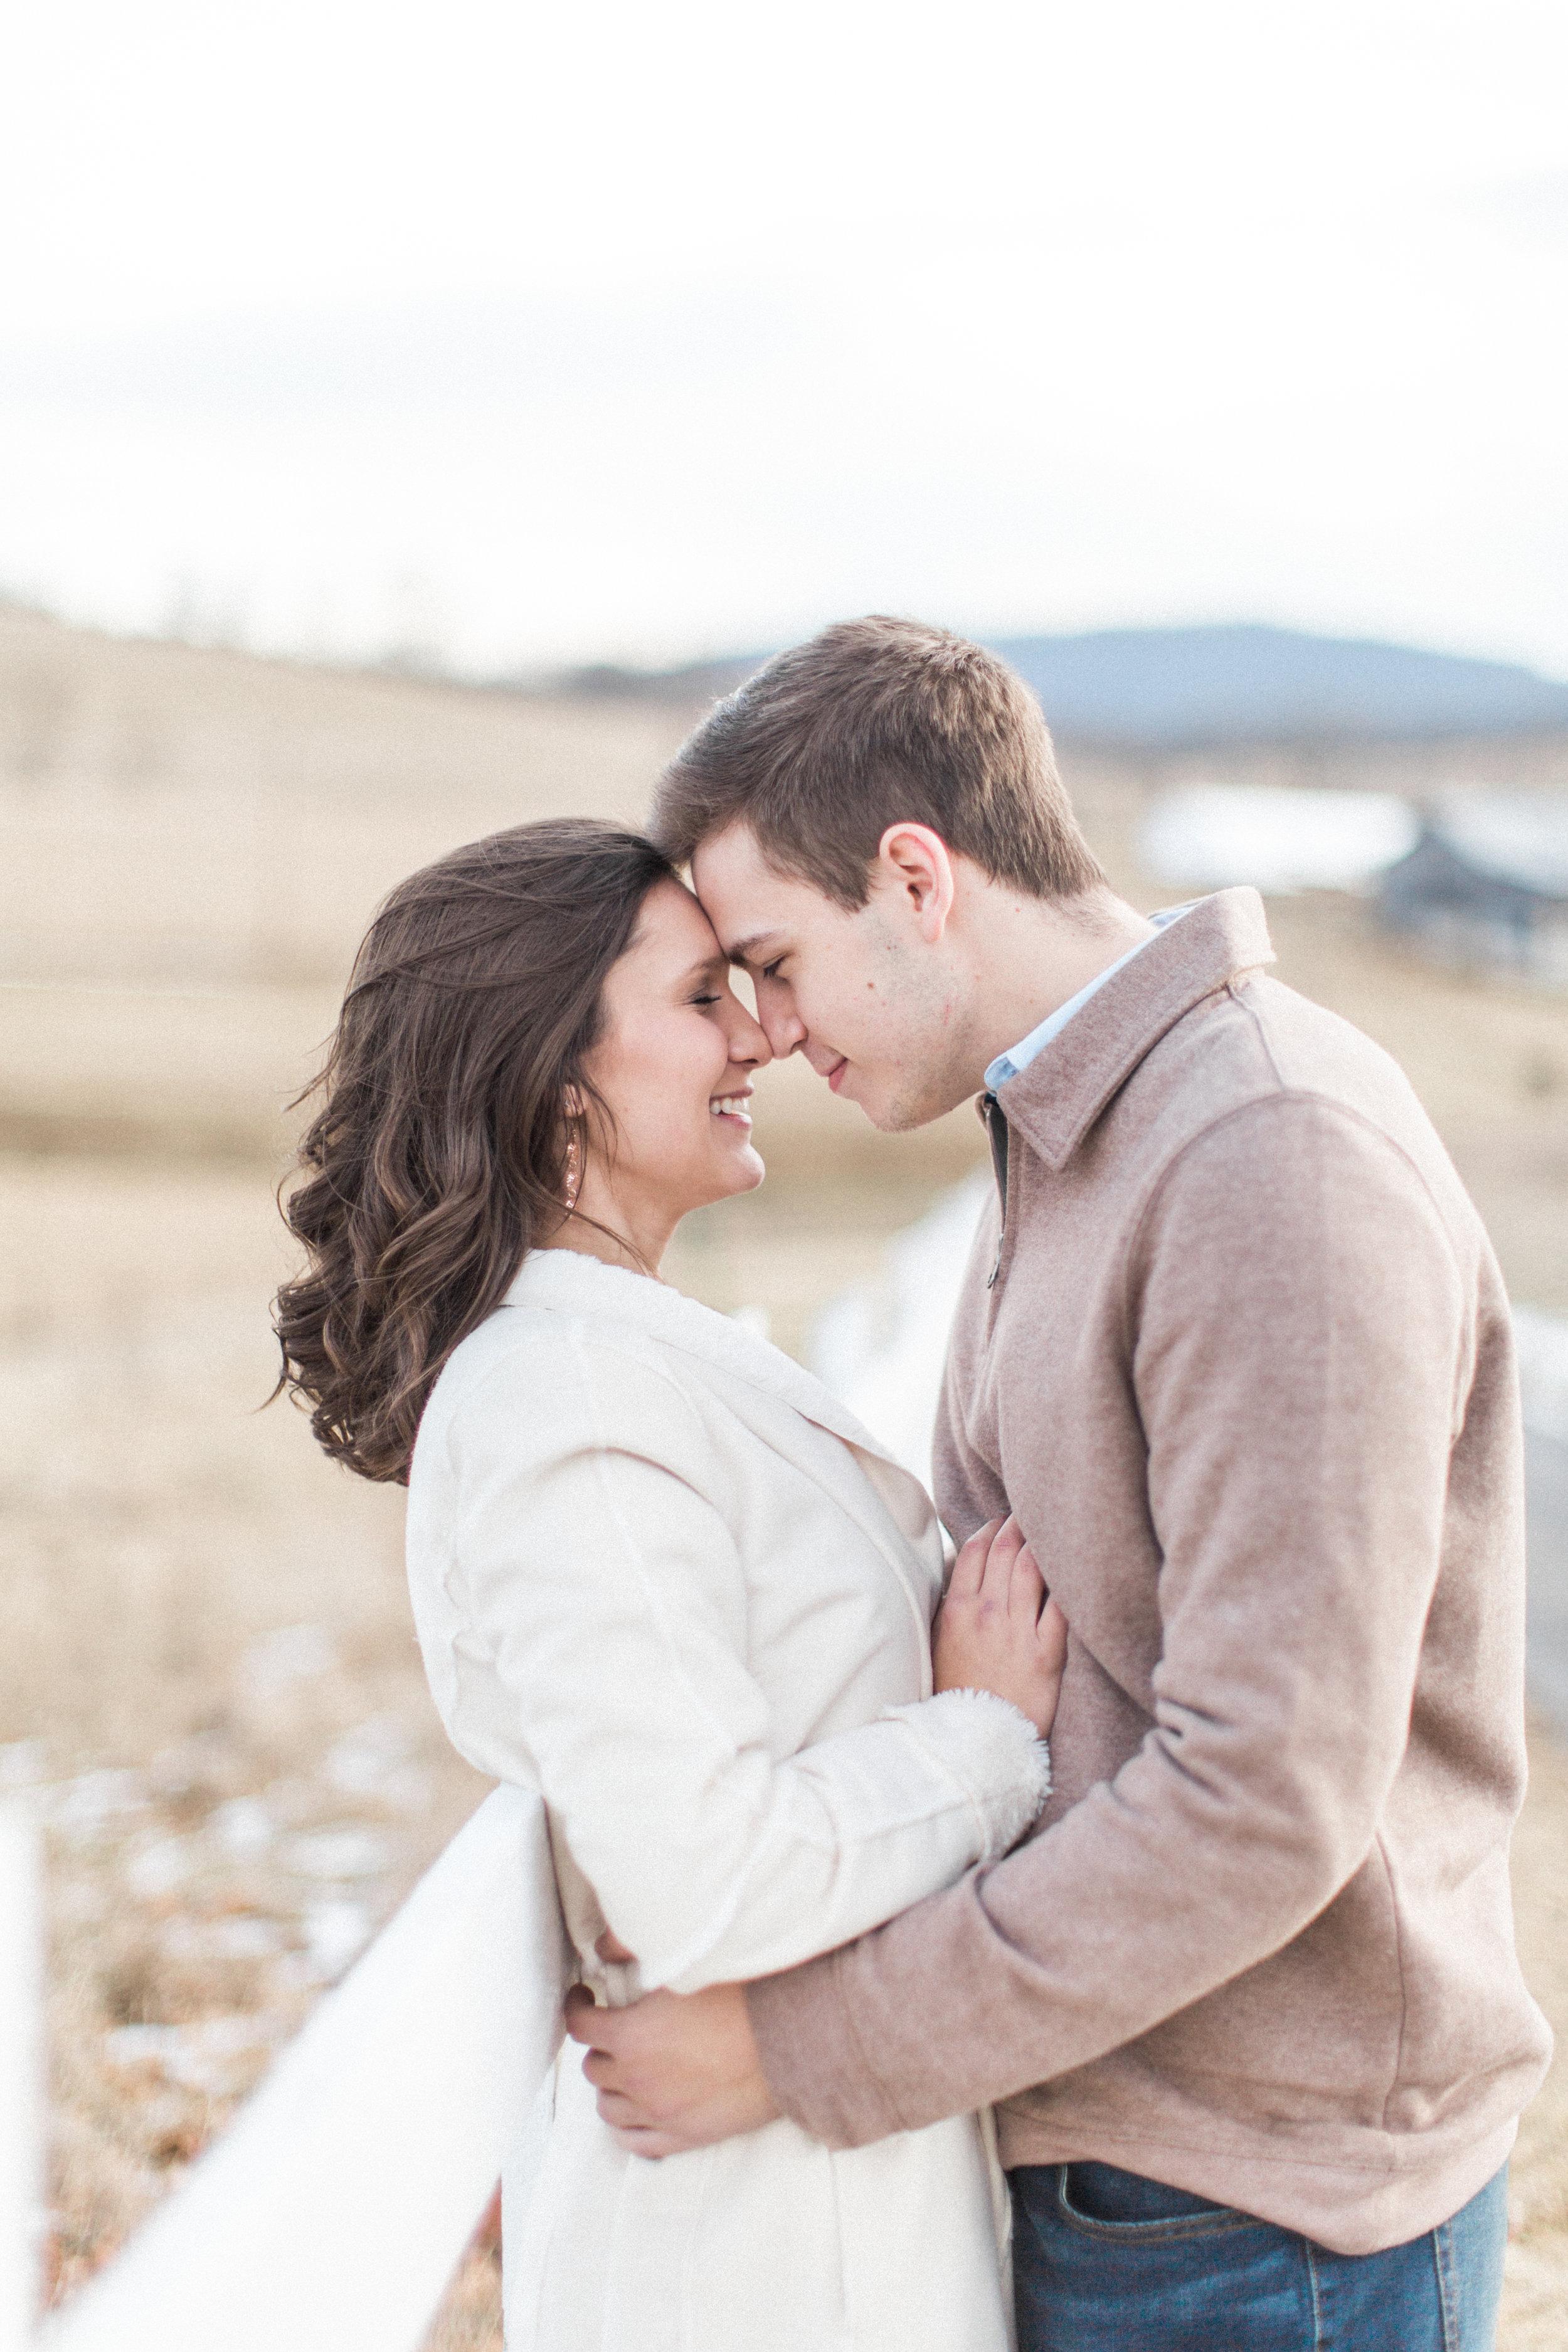 Abigail_Jill_Photography_Maryland_Engagement_Farm_Emily_Justin141.jpg